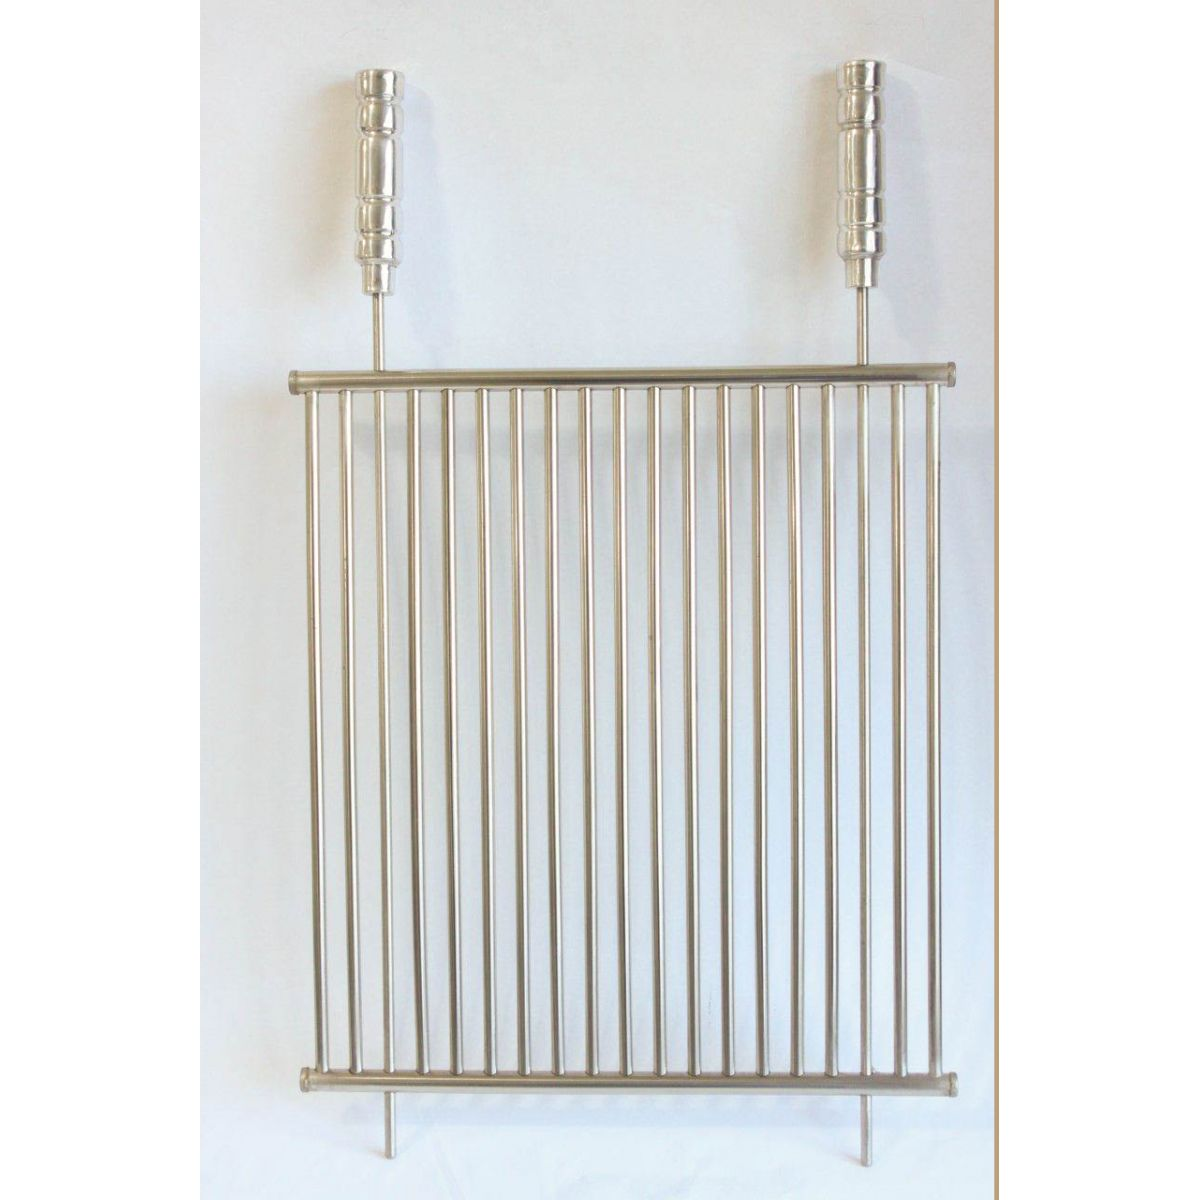 Grelha Tubular de Inox - 60cm x 45cm